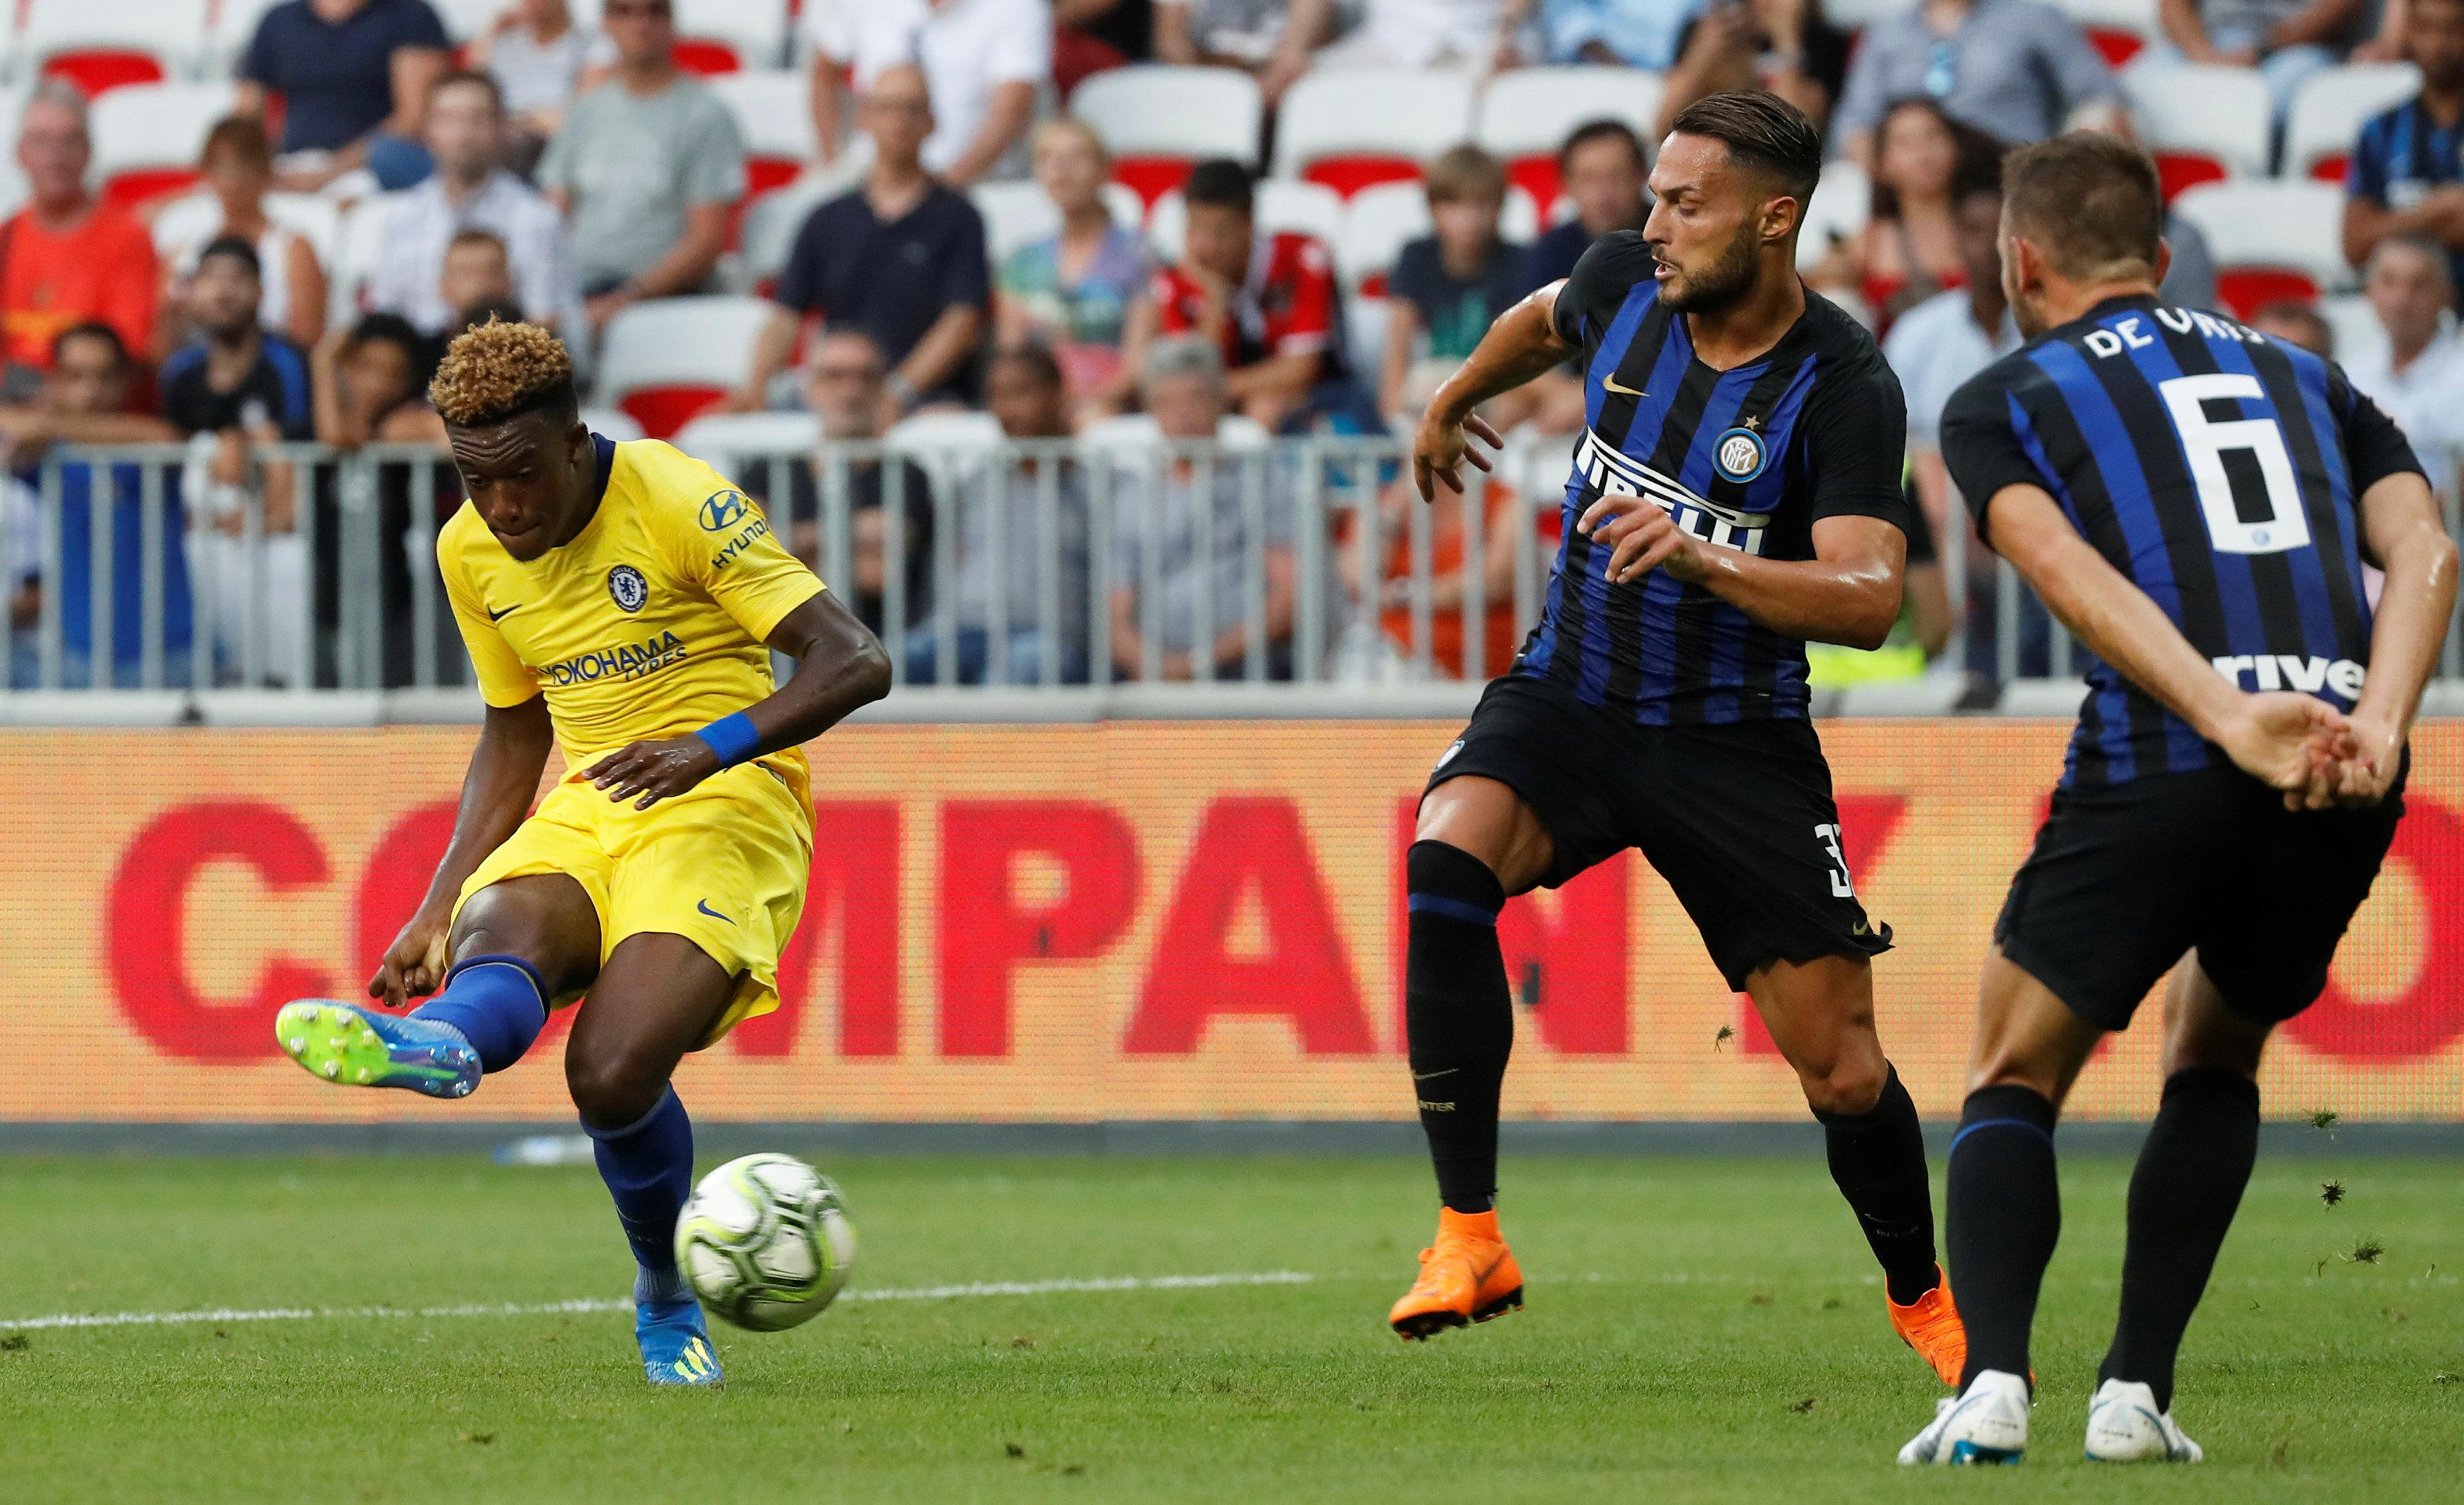 Hudson-Odoi in action against Inter Milan in pre-season